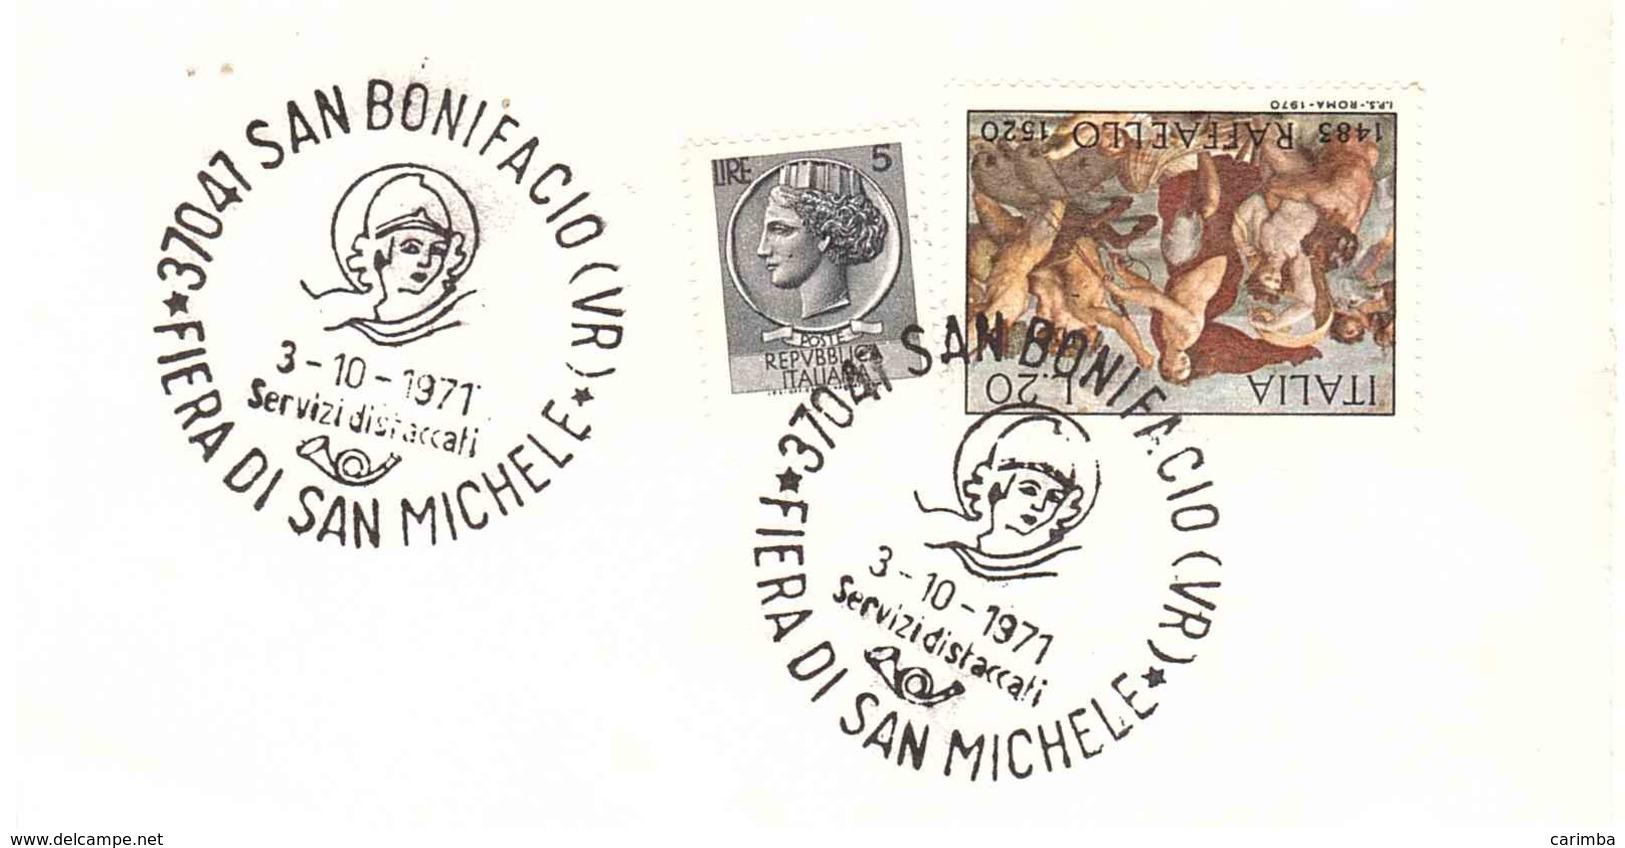 3.10.1971 SAN BONIFACIO VR FIERA DI SAN MICHELE - Affrancature Meccaniche Rosse (EMA)